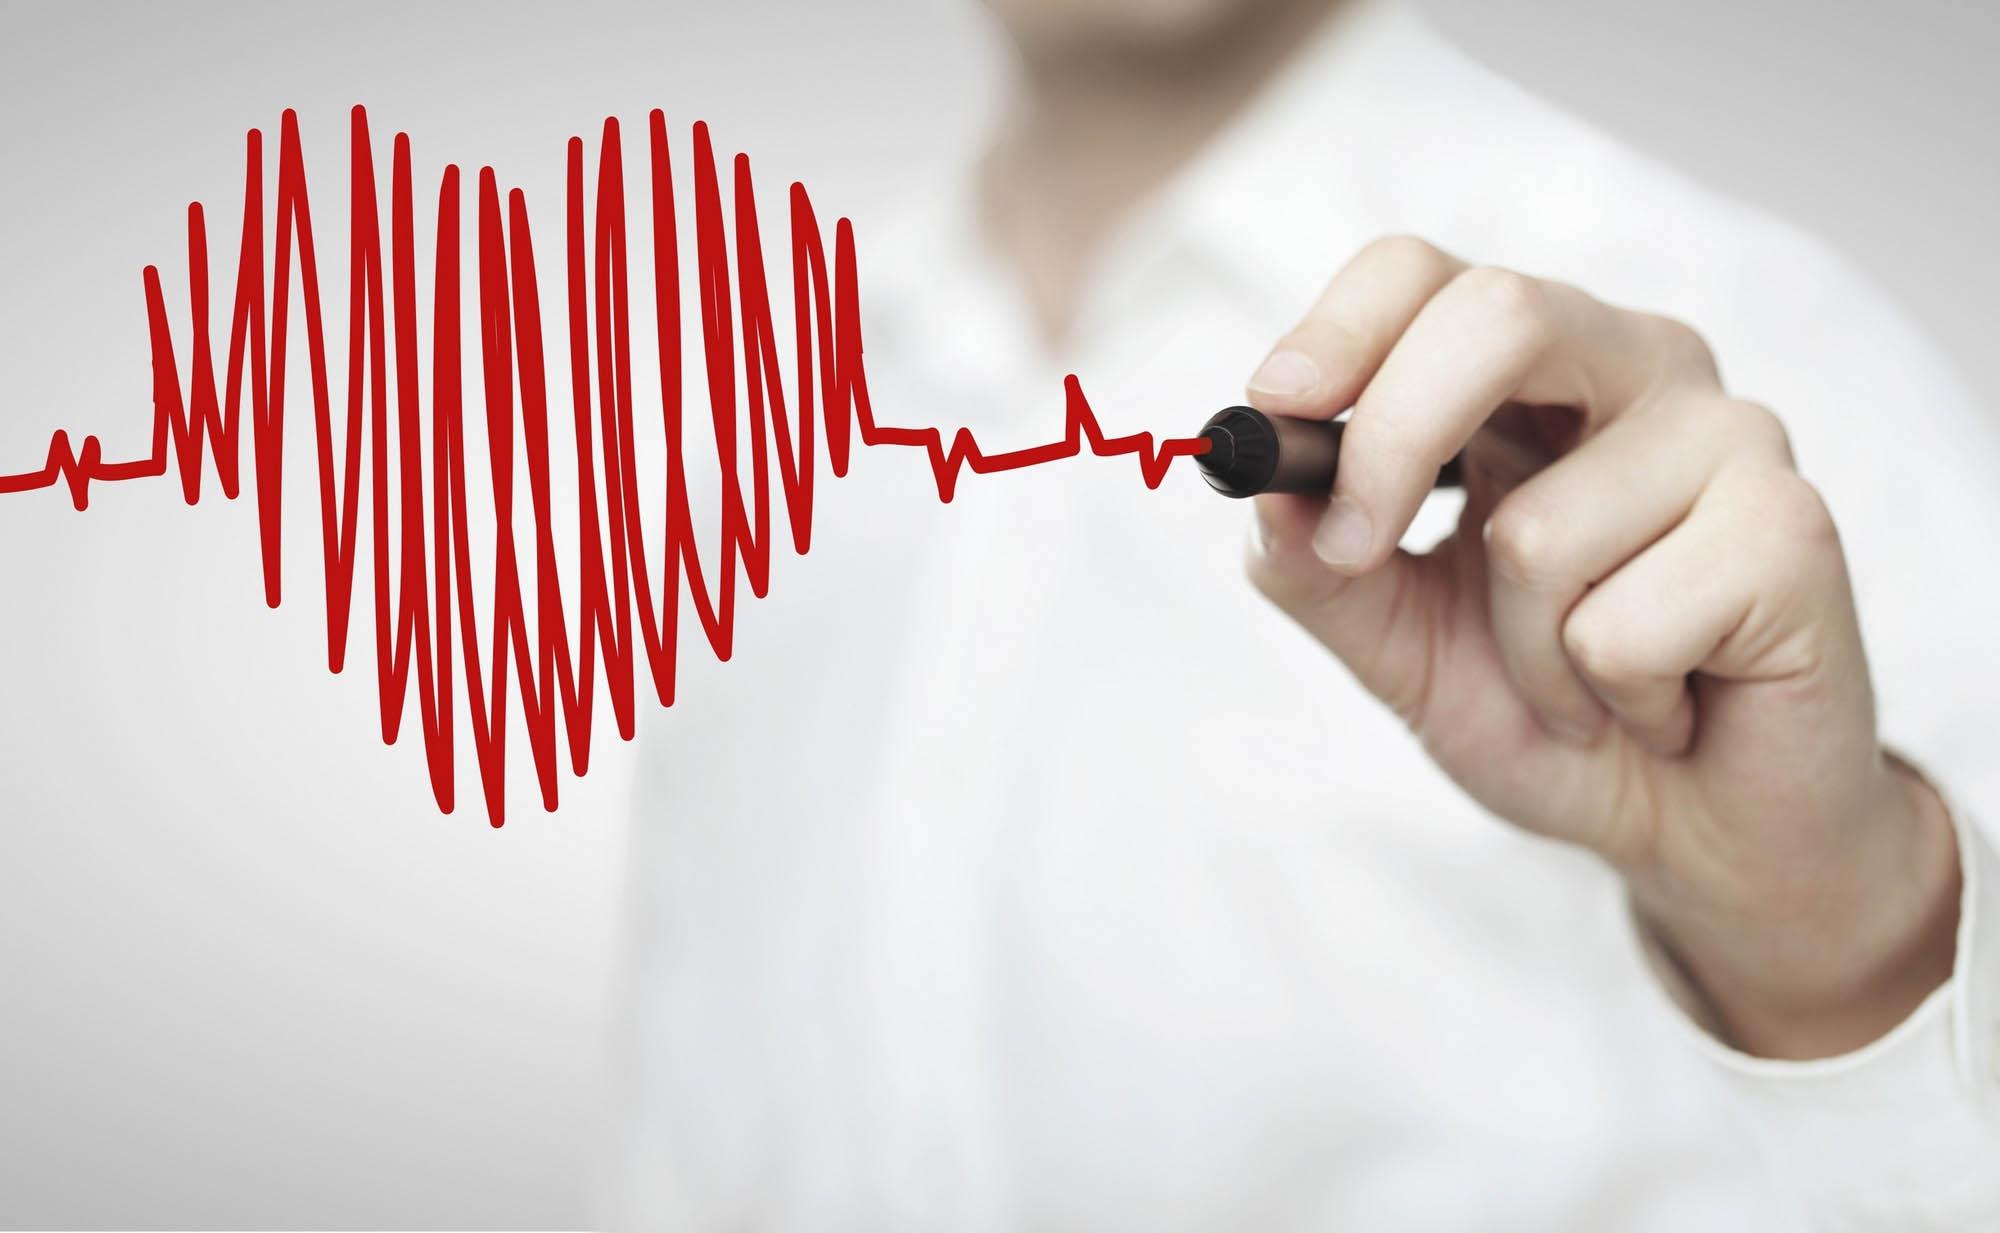 https://www.poliklinika-saric.com/wp-content/uploads/2016/04/slika-heartbeat-1.jpg